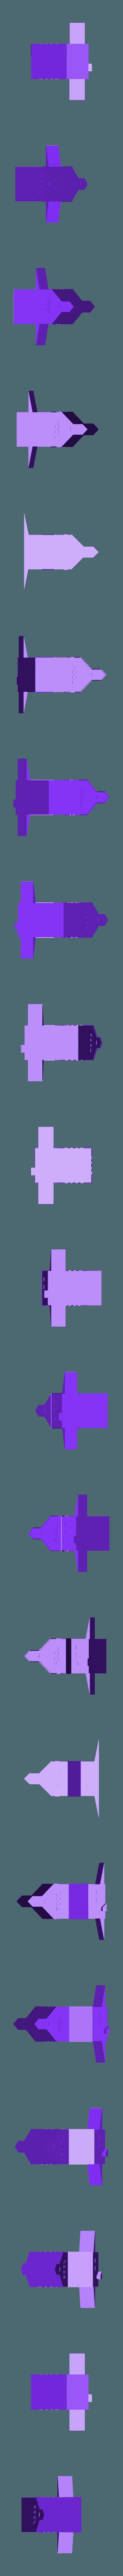 Grain_Elevator_-_Pool_-_N_Scale.stl Download free STL file Grain Elevators (N-Scale) • 3D printing model, MFouillard